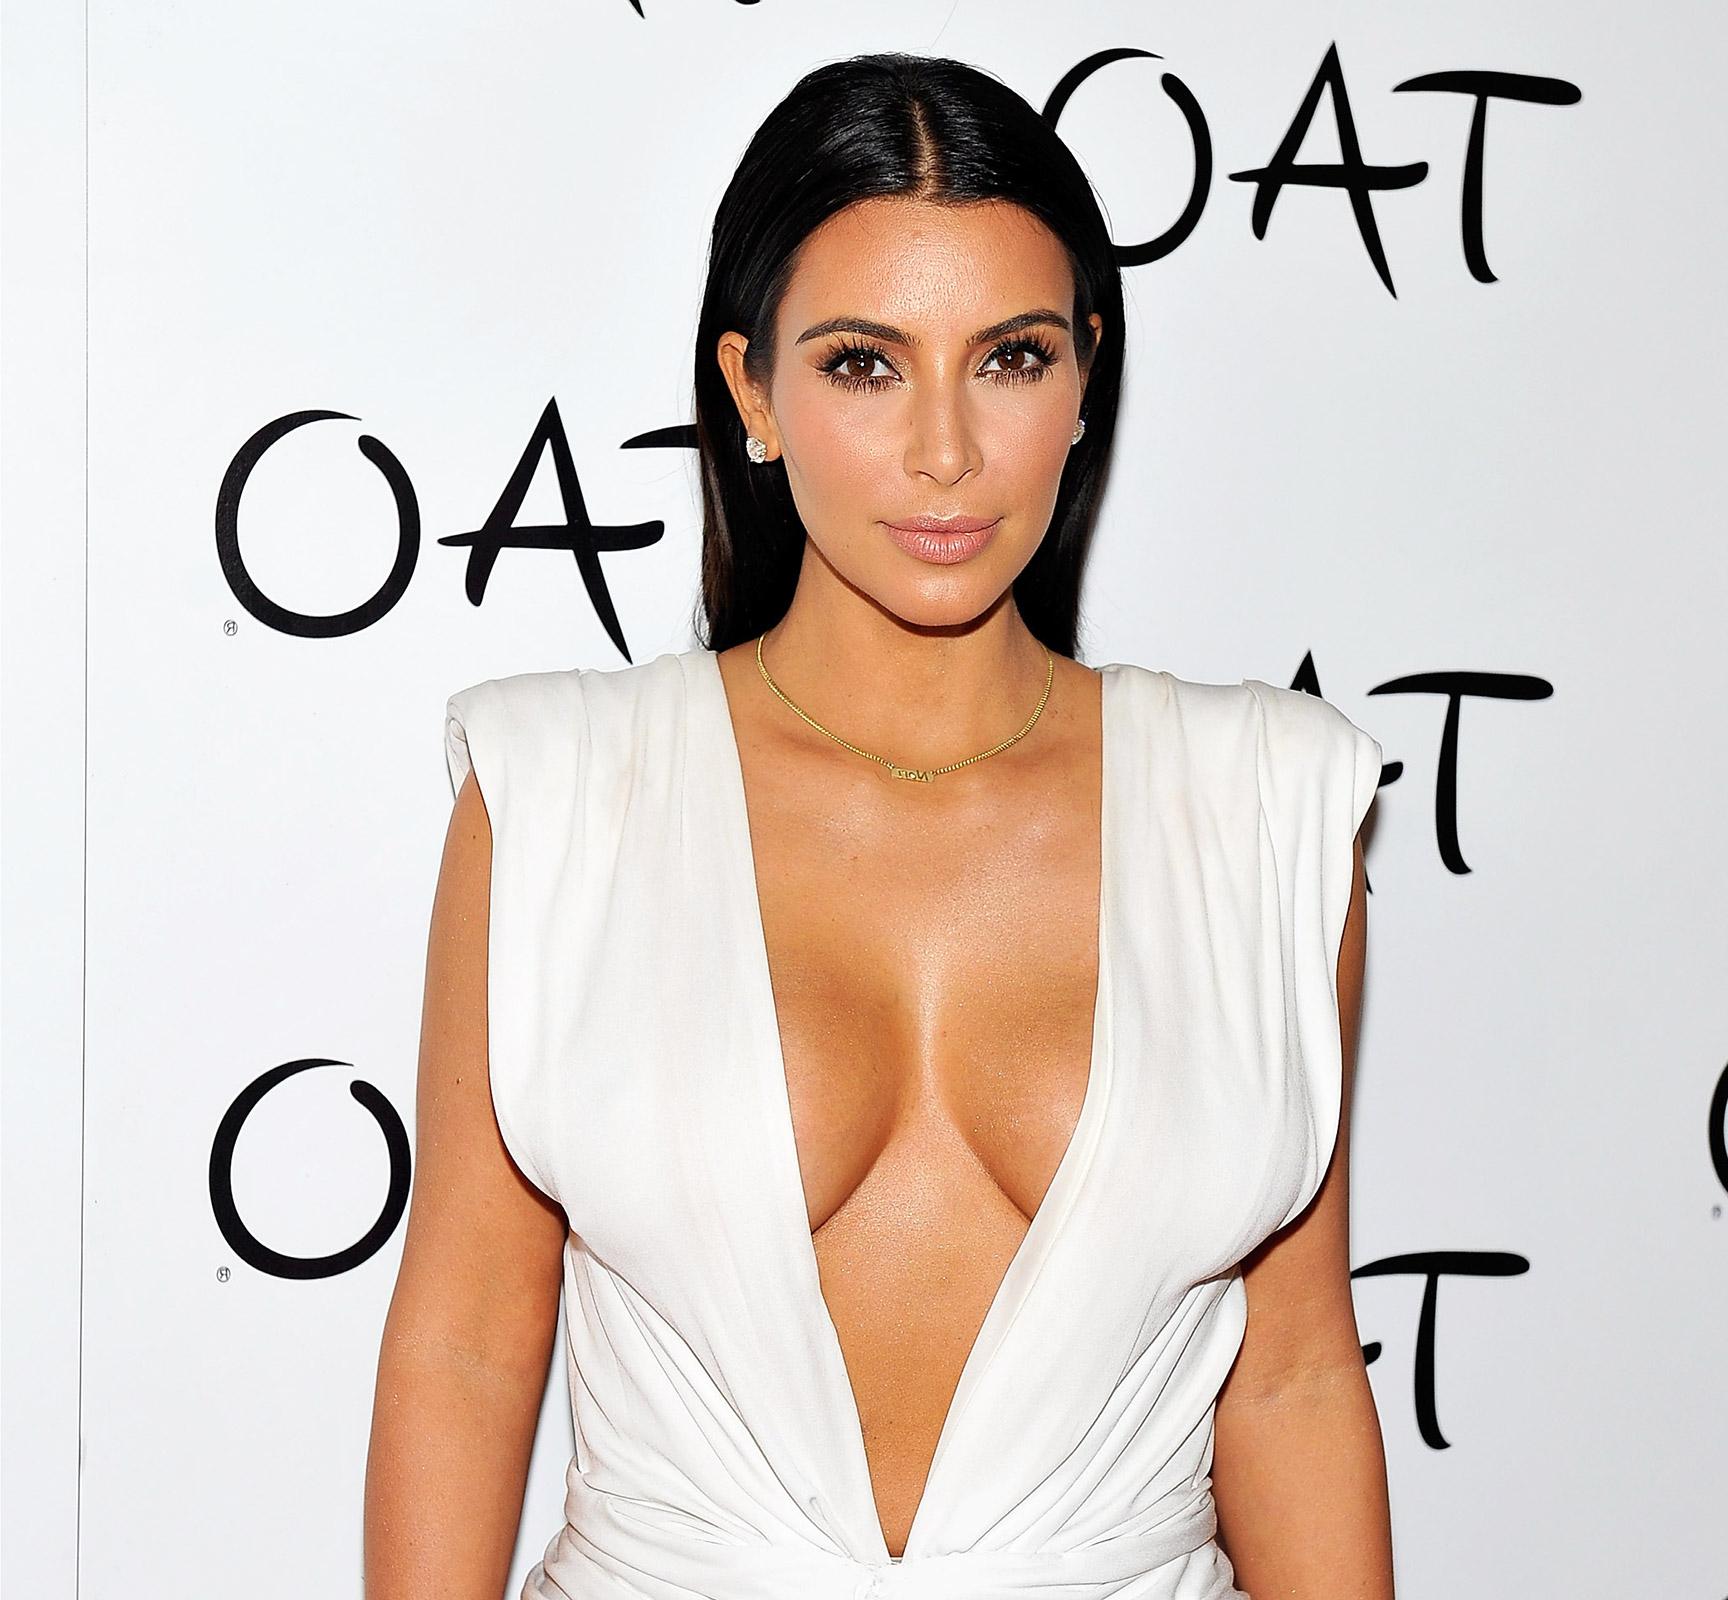 Kim Kardashian Iphone 5 Wallpaper 1728x1600